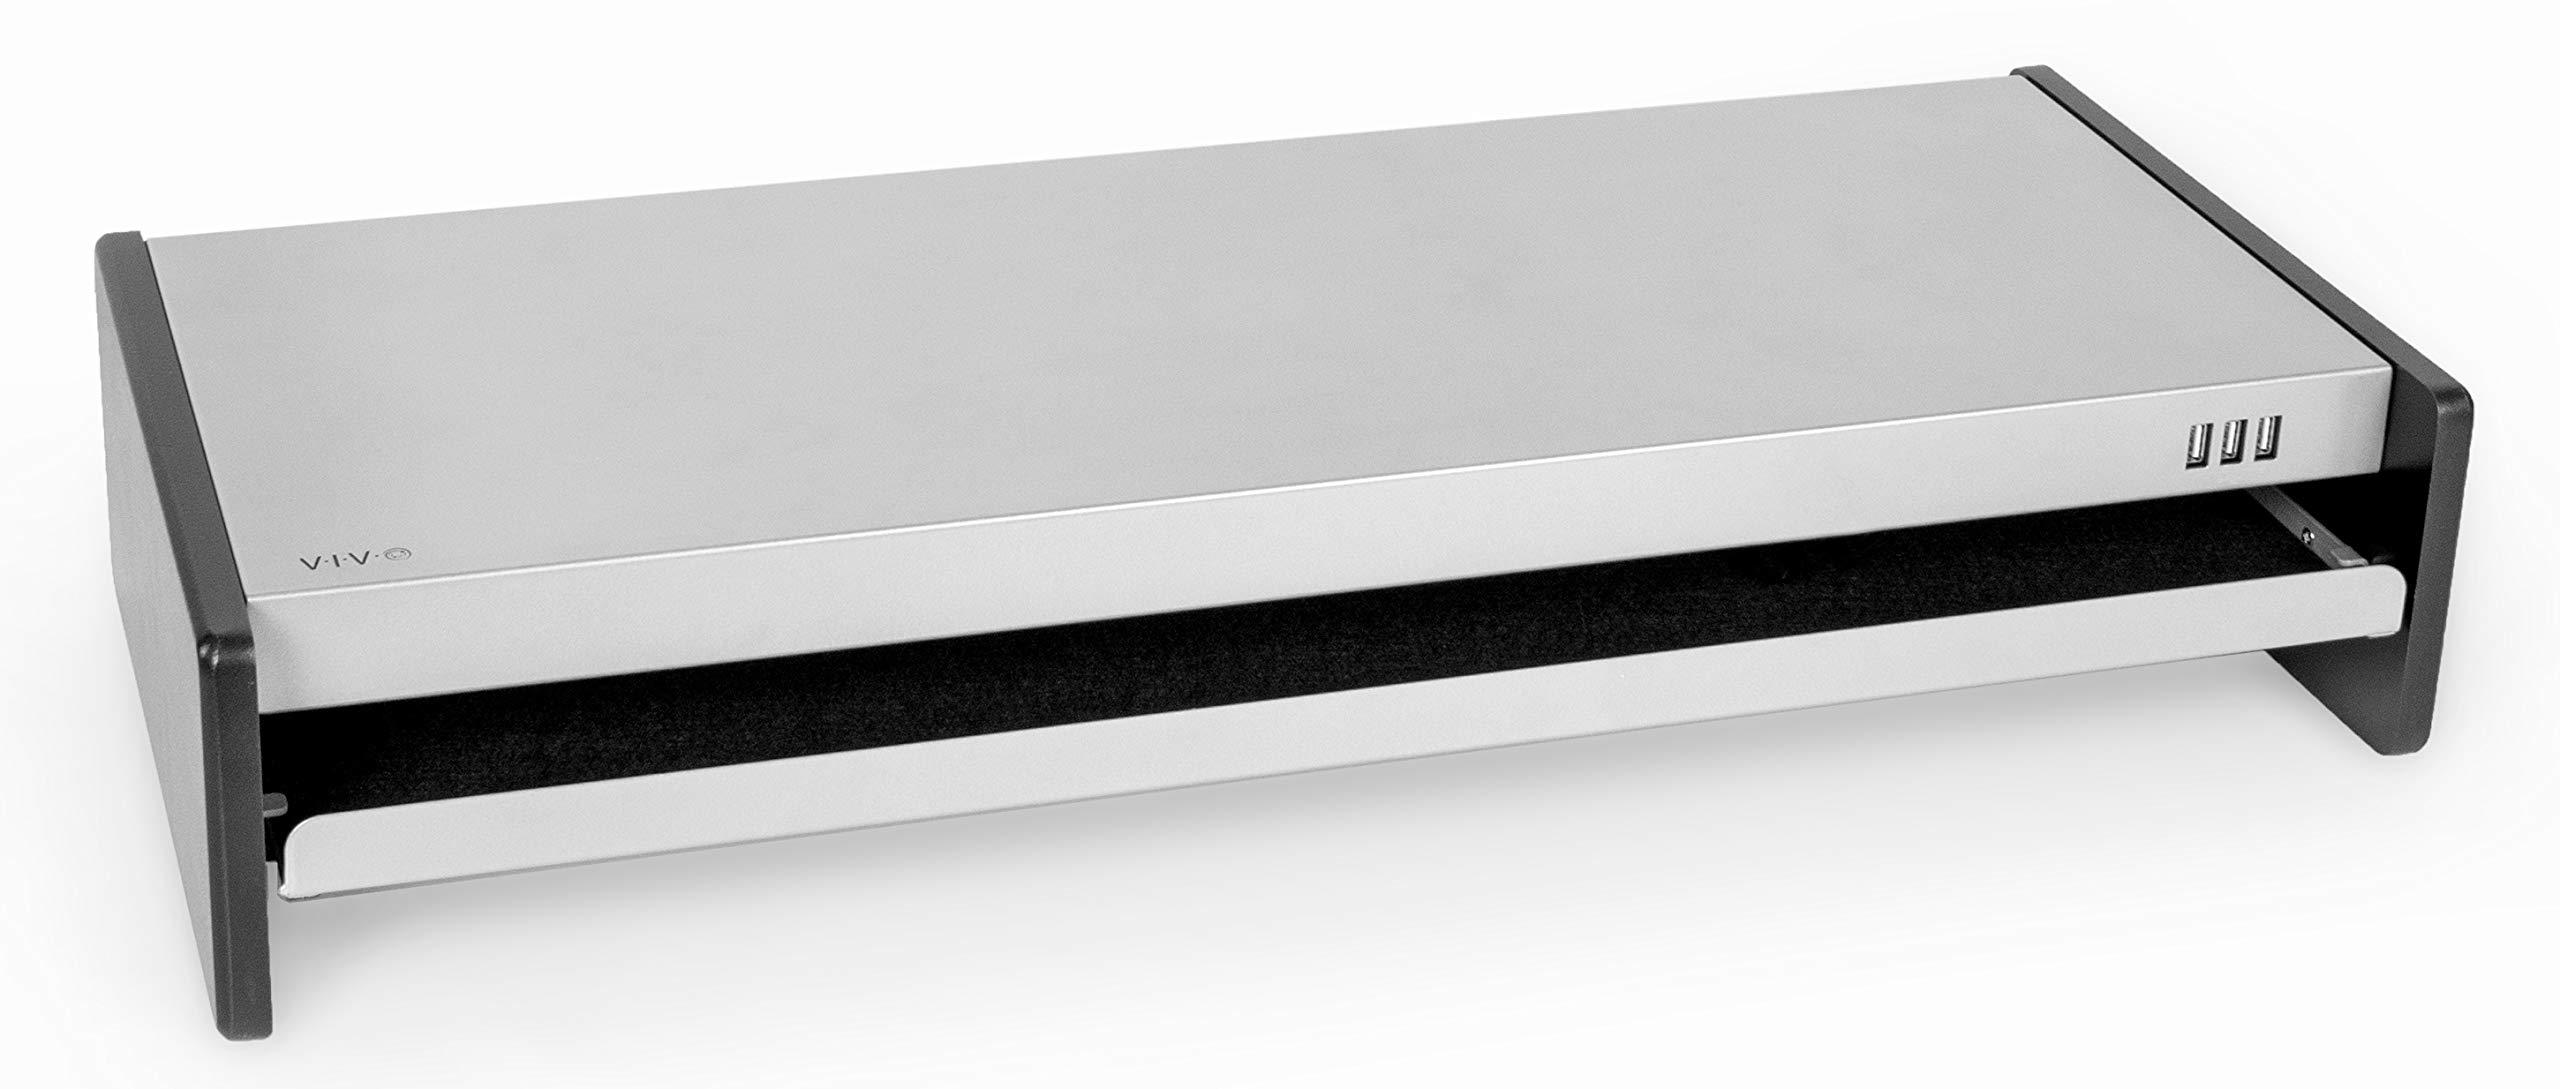 "VIVO Steel Ergonomic Desk Computer Monitor Laptop Printer Riser Stand | Desktop Organizer with Storage Drawer and 3 USB Ports 28"" (STAND-V000N)"